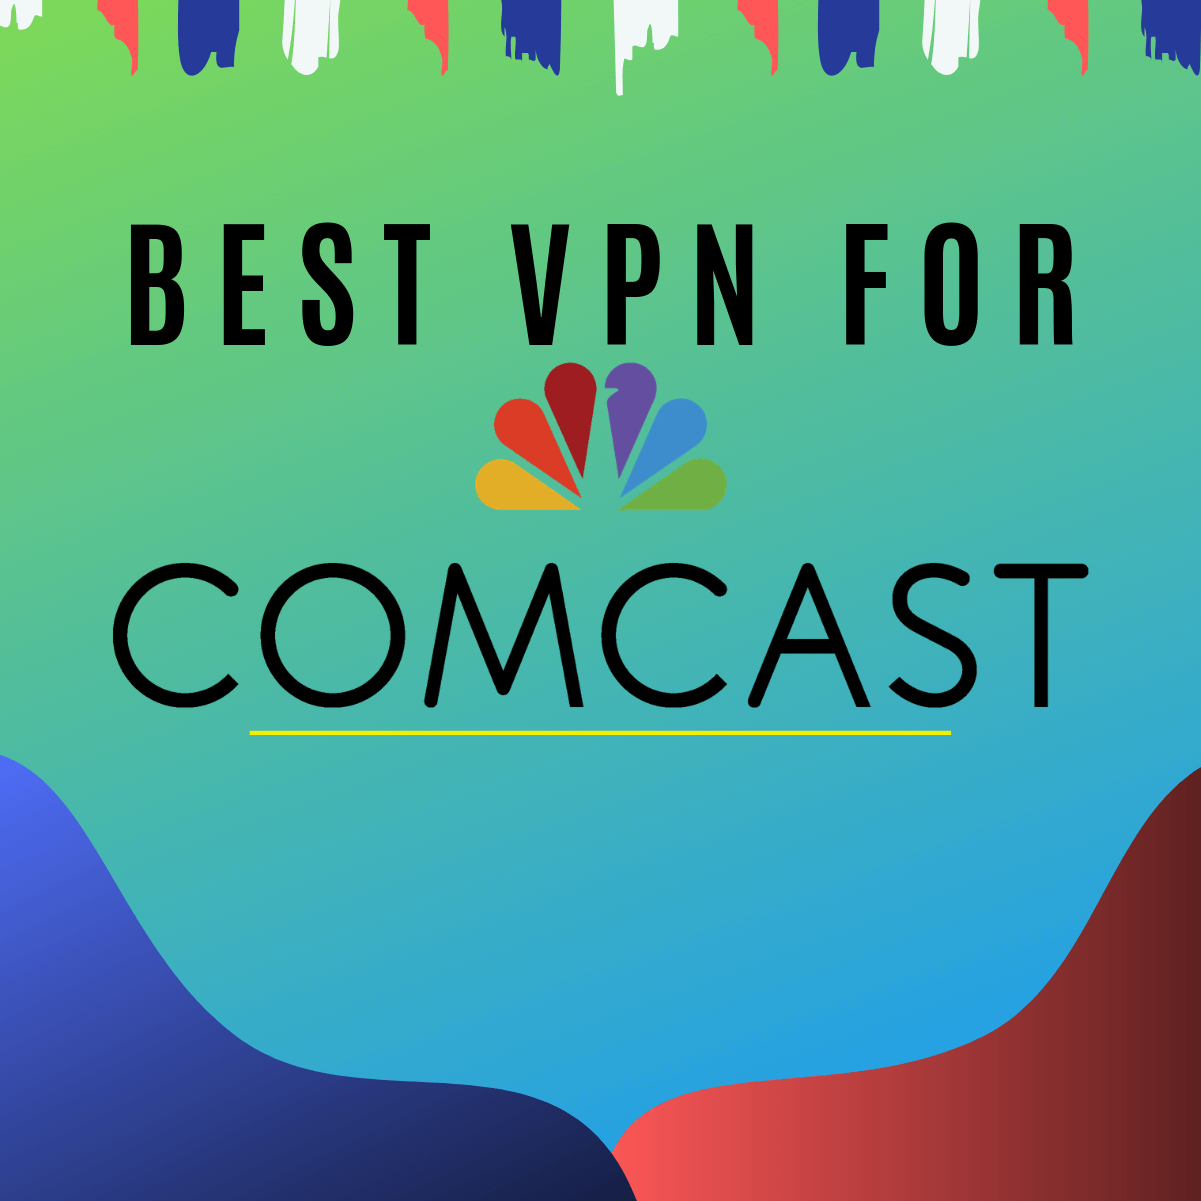 Best VPN for Comcast Xfinity 2019 - Unthrottled speed